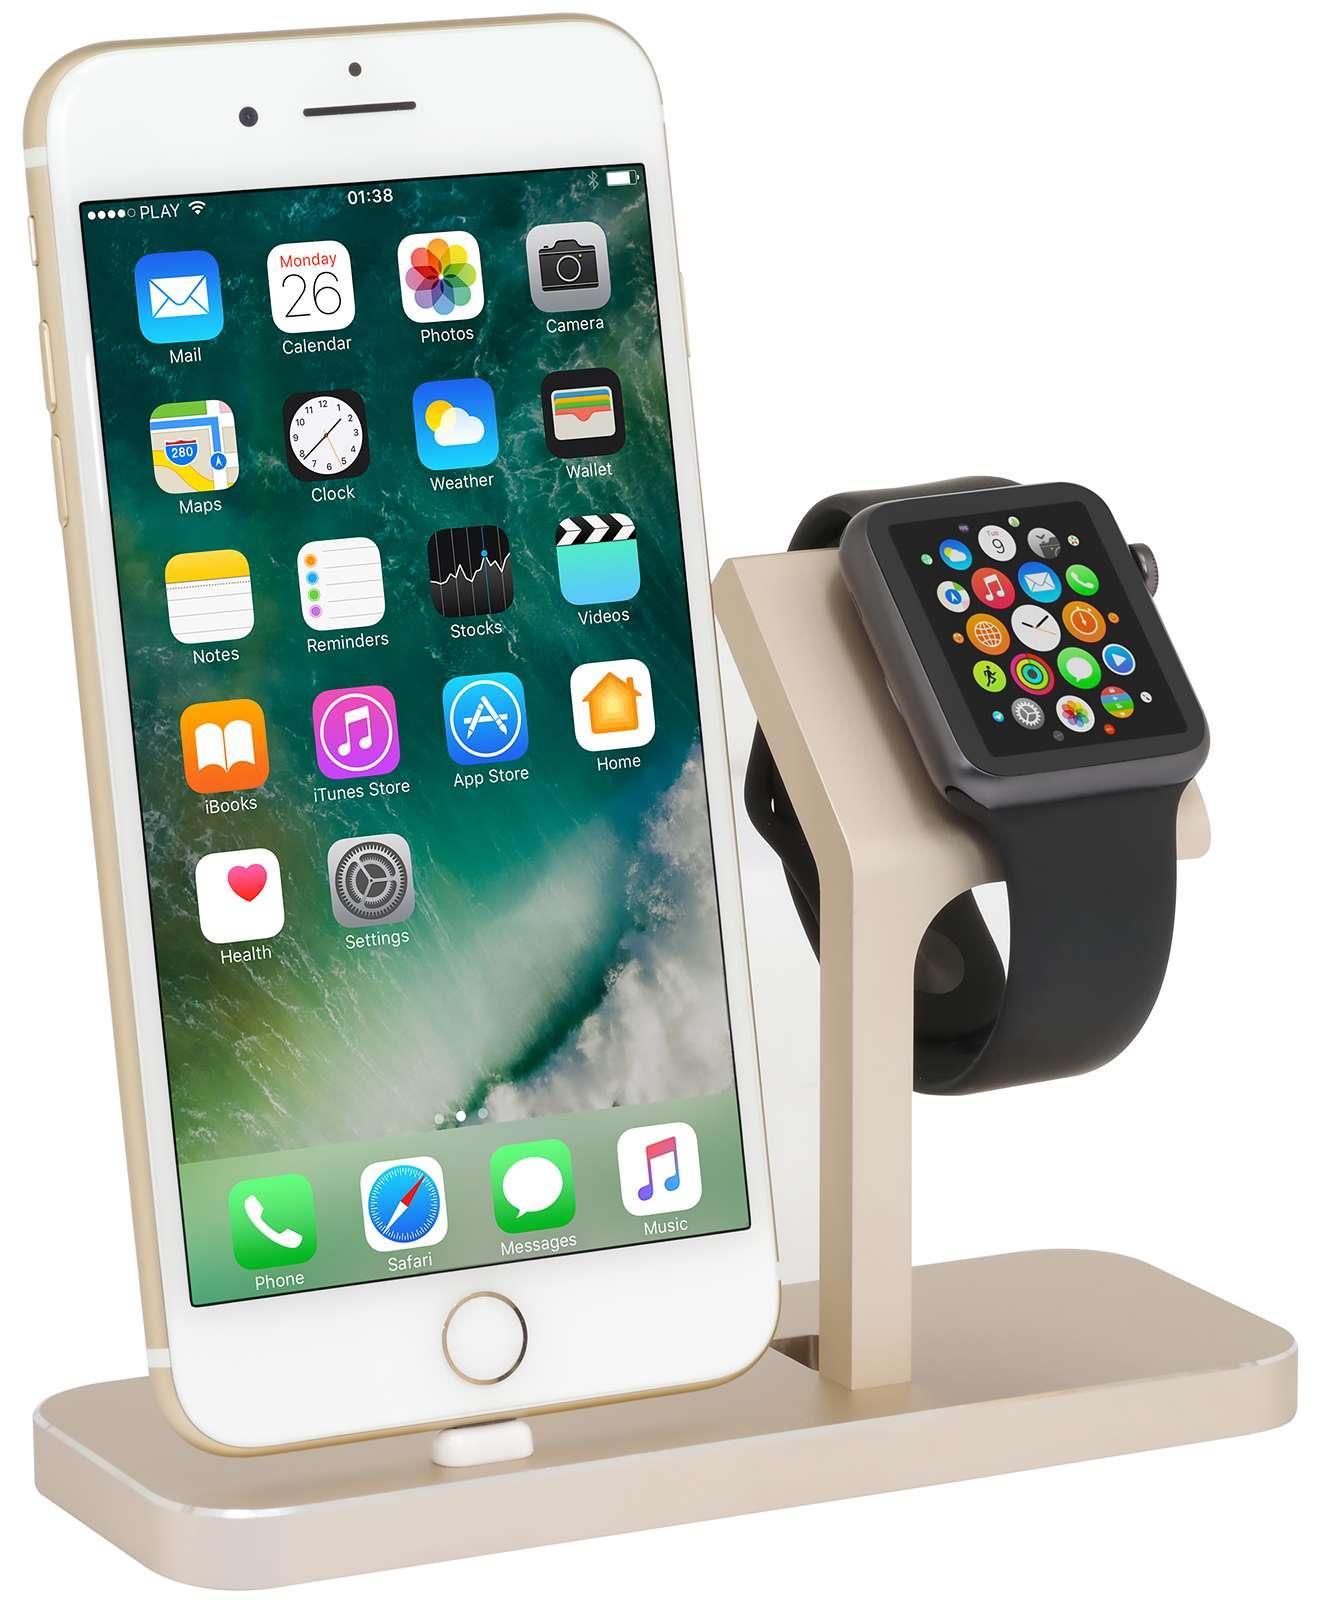 apple watch iphone dockingstation twindock gold 01 1280x1280 2x